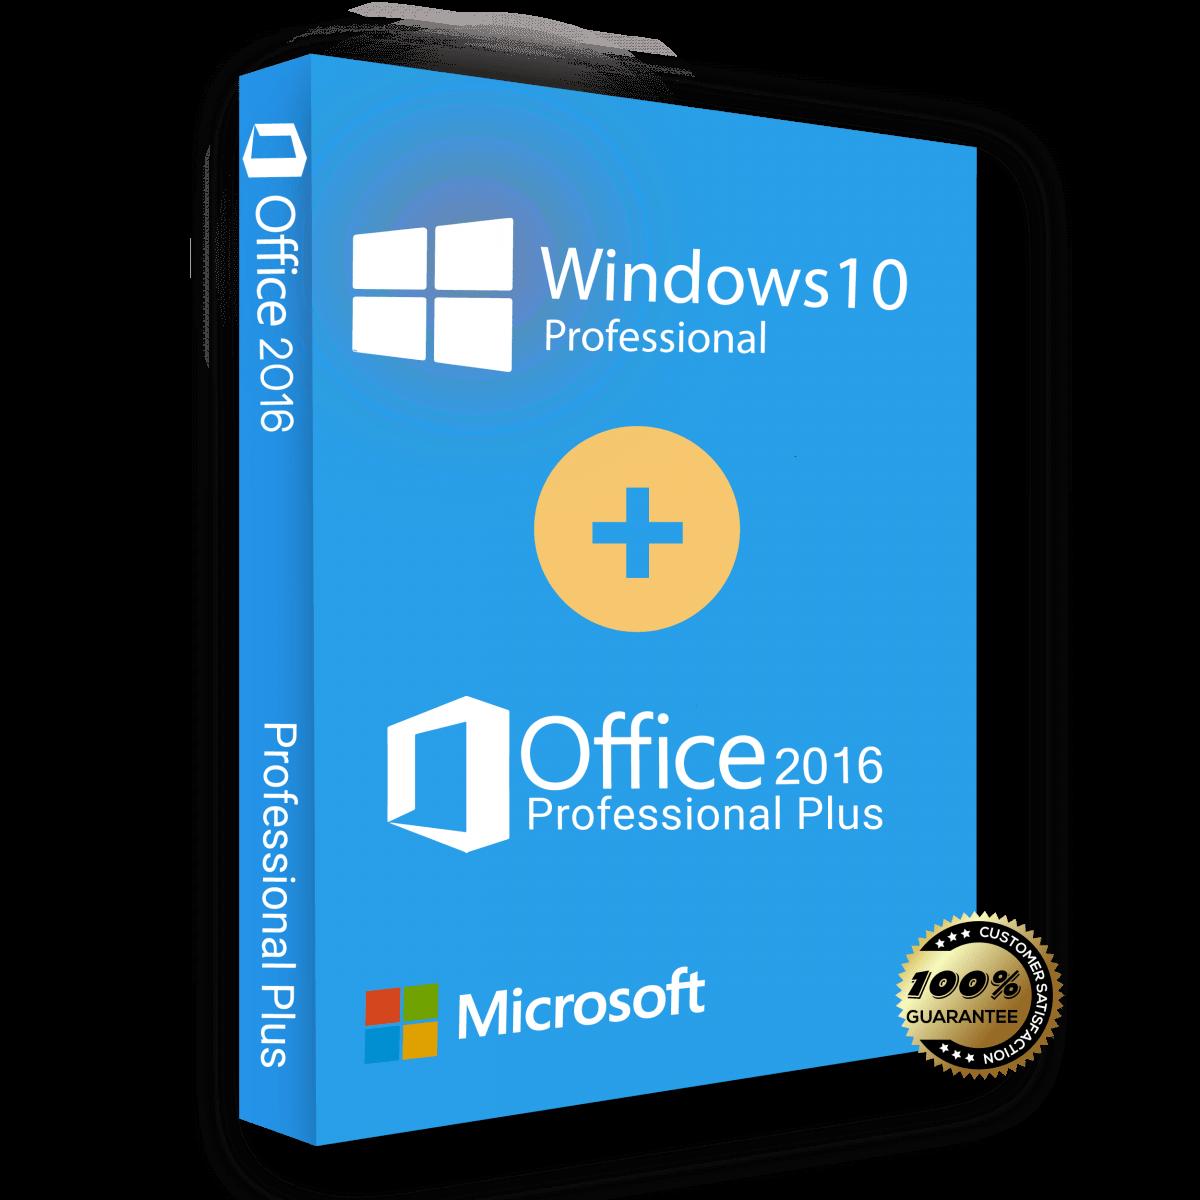 Windows 10 Pro and Office 2016 pro